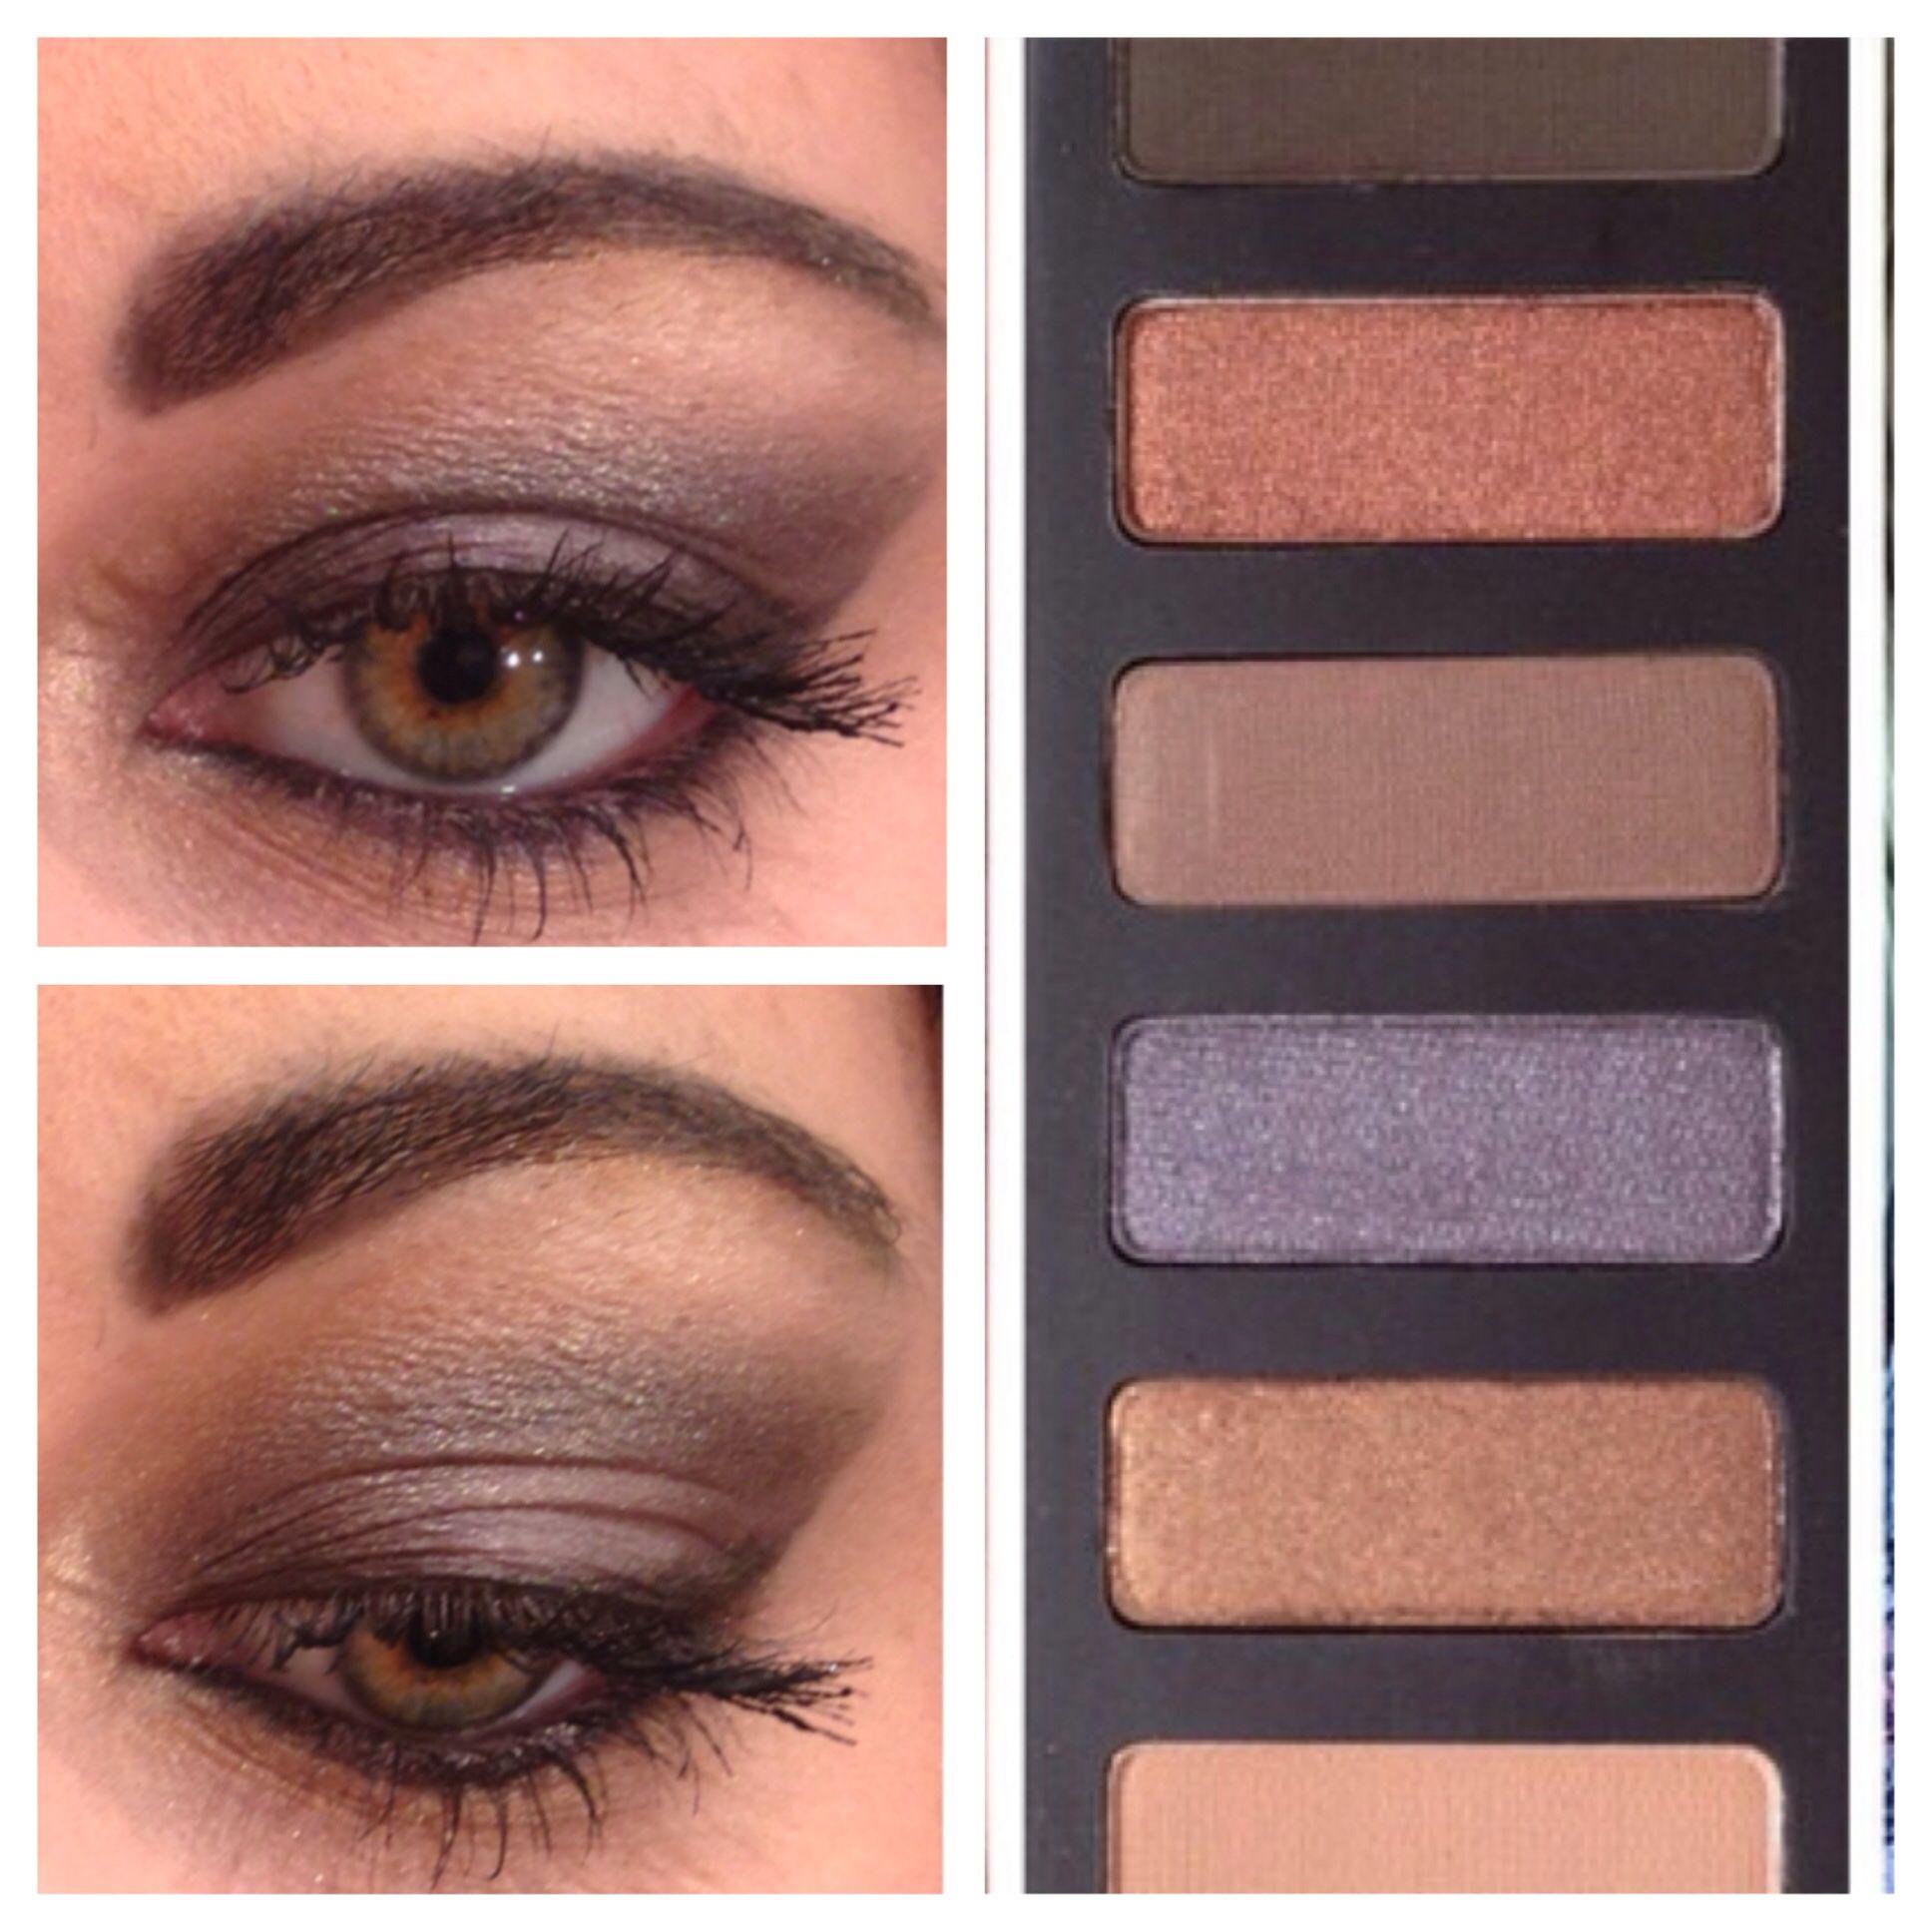 Merle Norman Everyday Essentials Palette Everyday Essentials Products Makeup Looks Eyeshadow